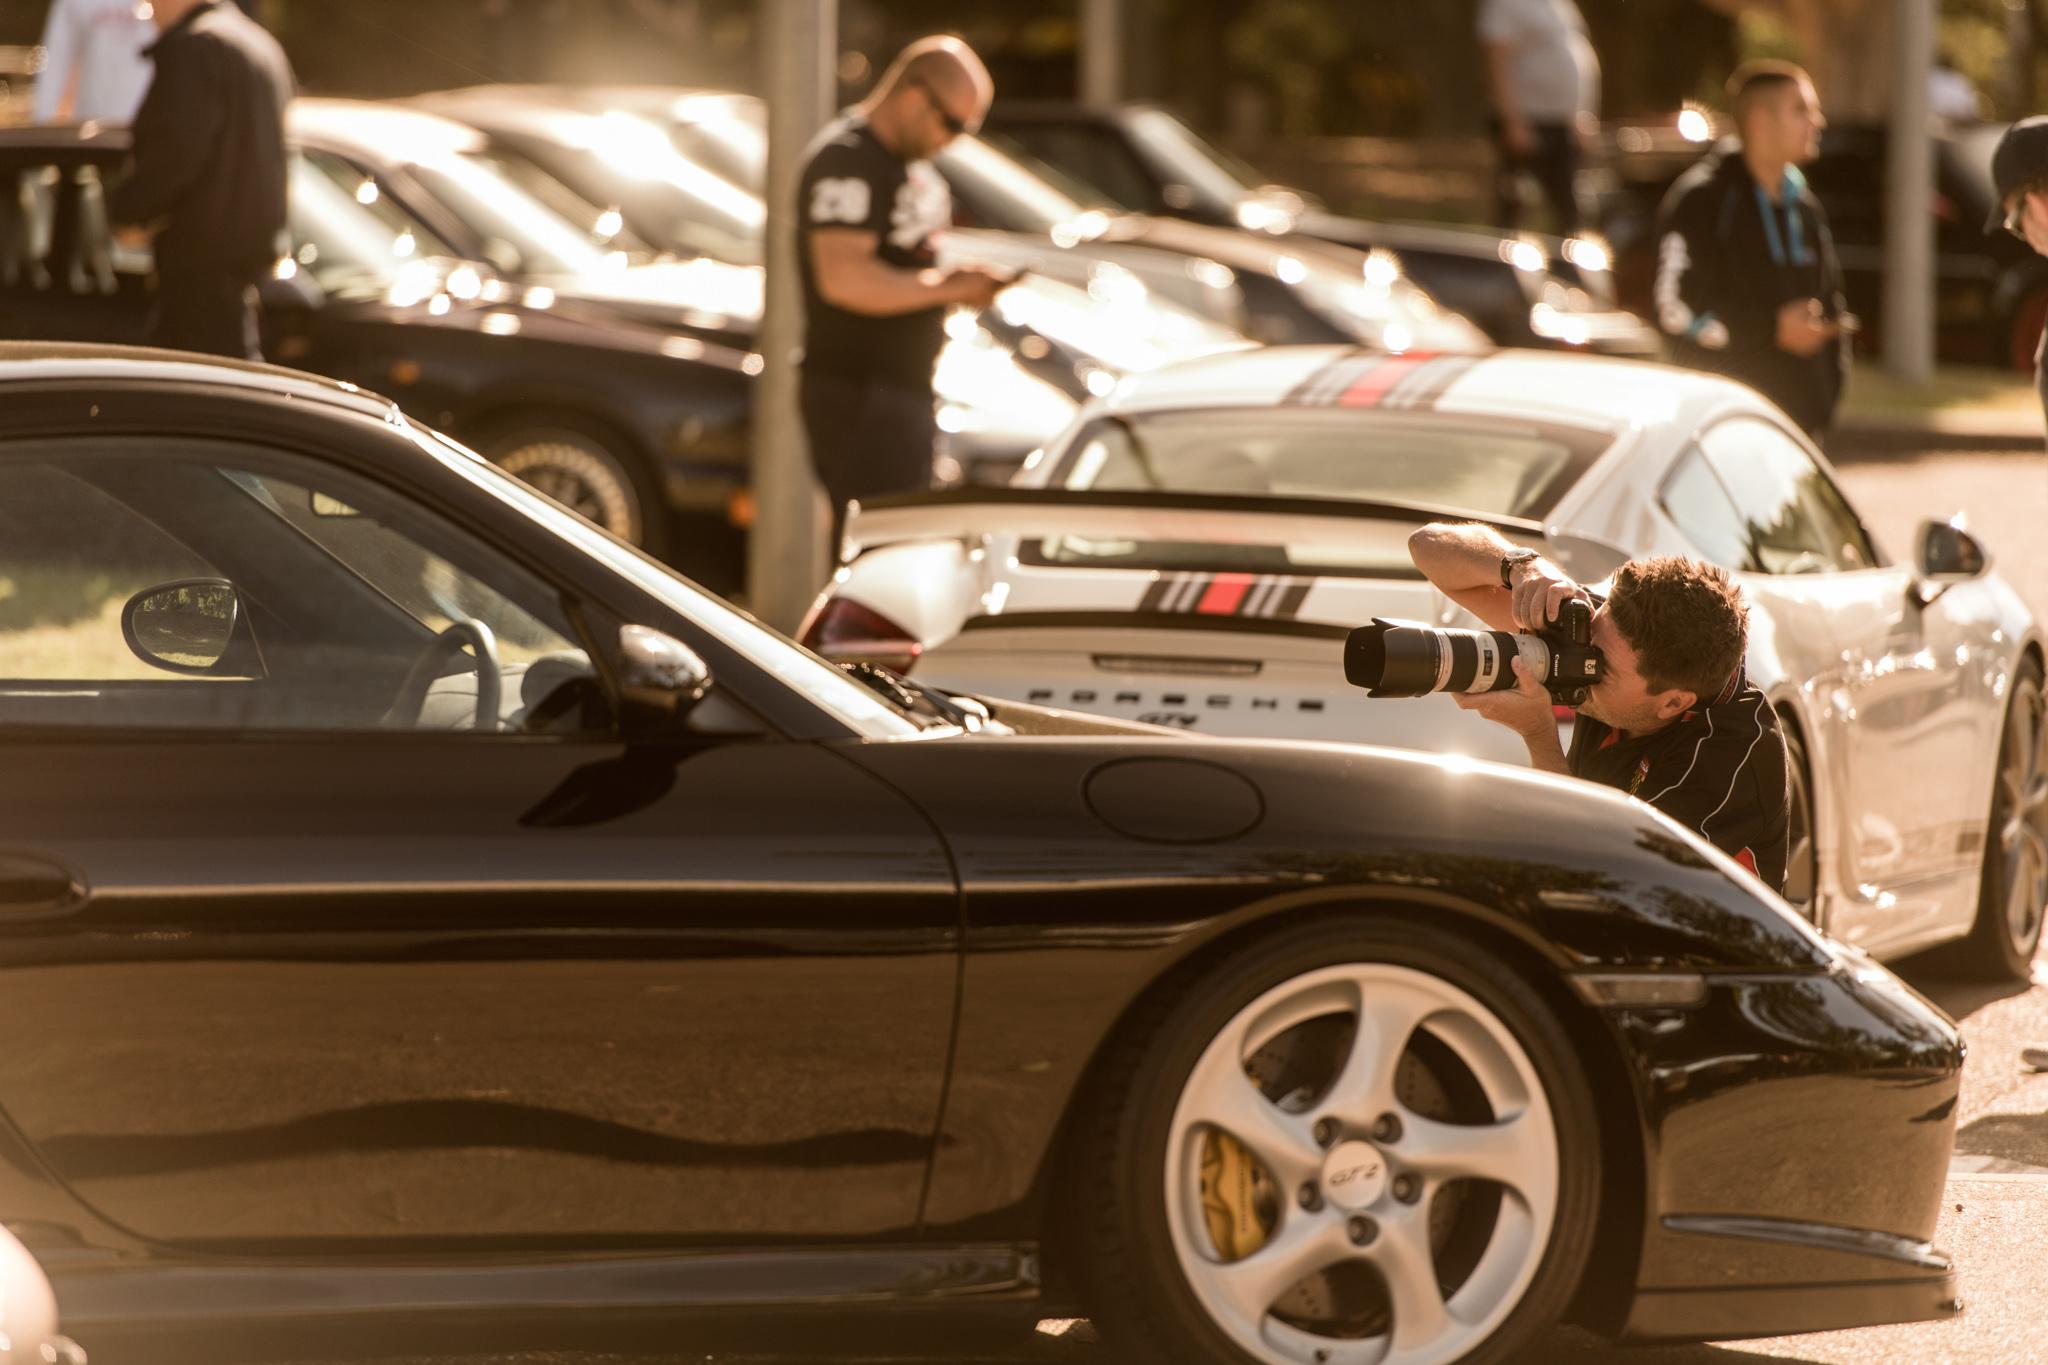 2019-10-27 - Autohaus Porsches & Coffee 130